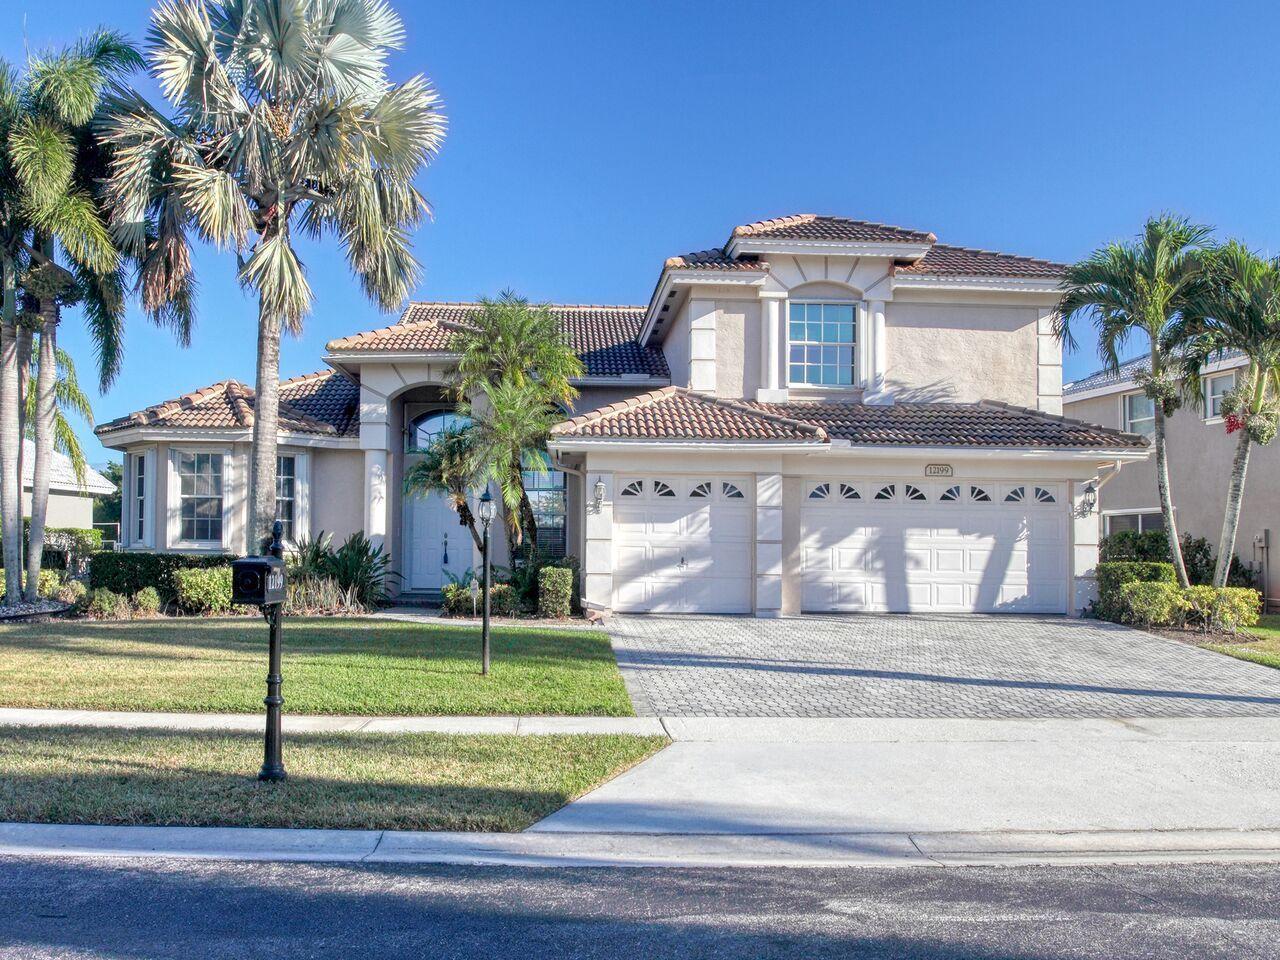 Photo of 12199 Rockledge Circle, Boca Raton, FL 33428